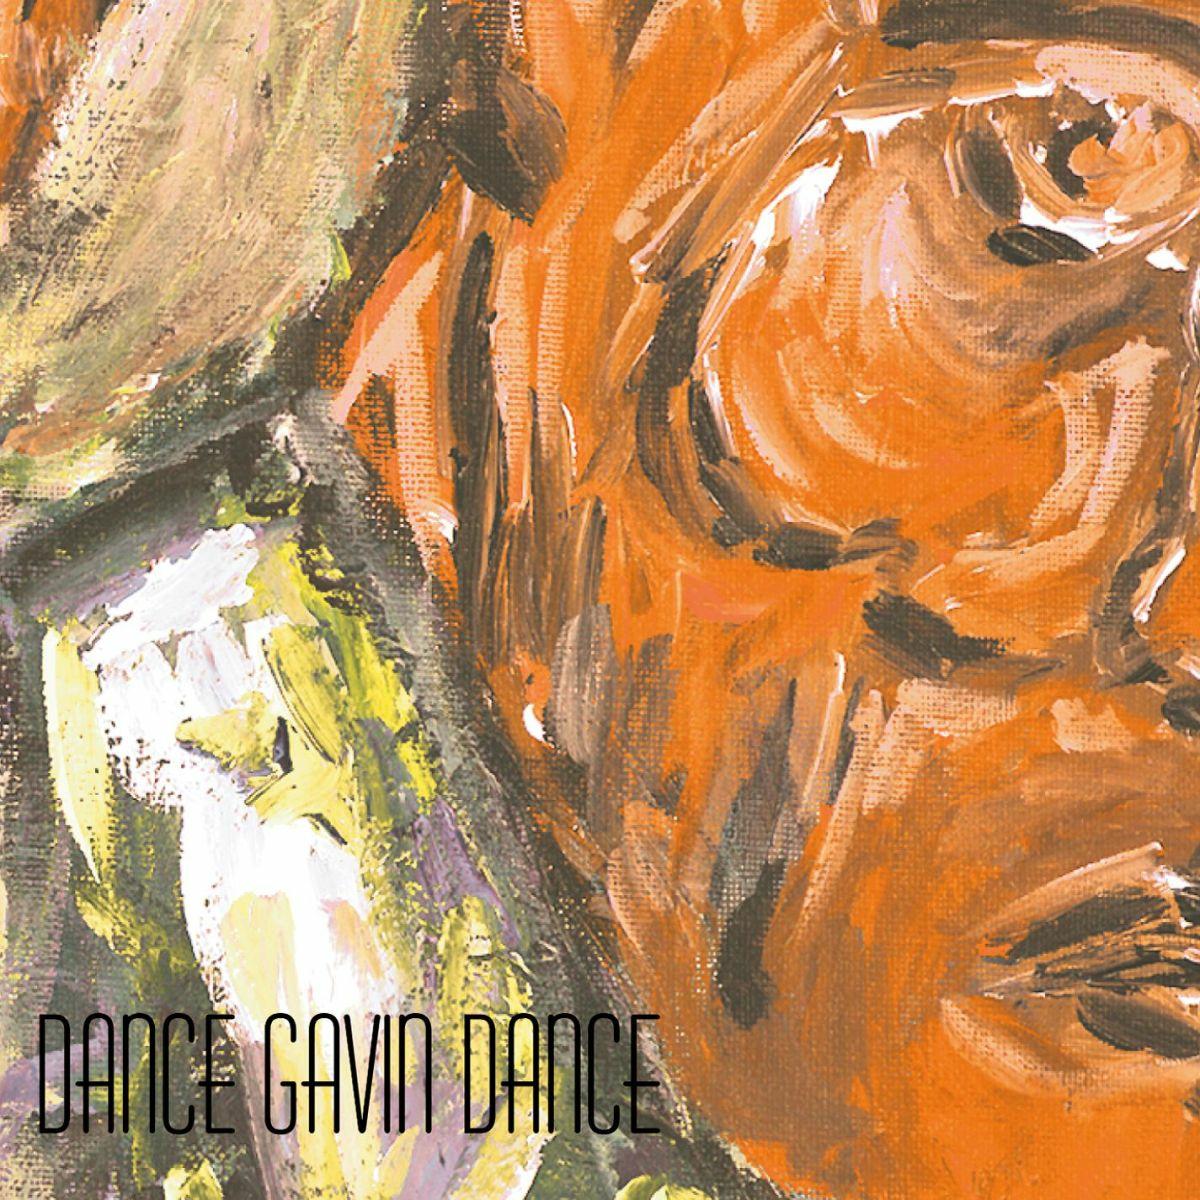 Dance Gavin Dance - Whatever I Say Is Royal Ocean [EP] (2006)